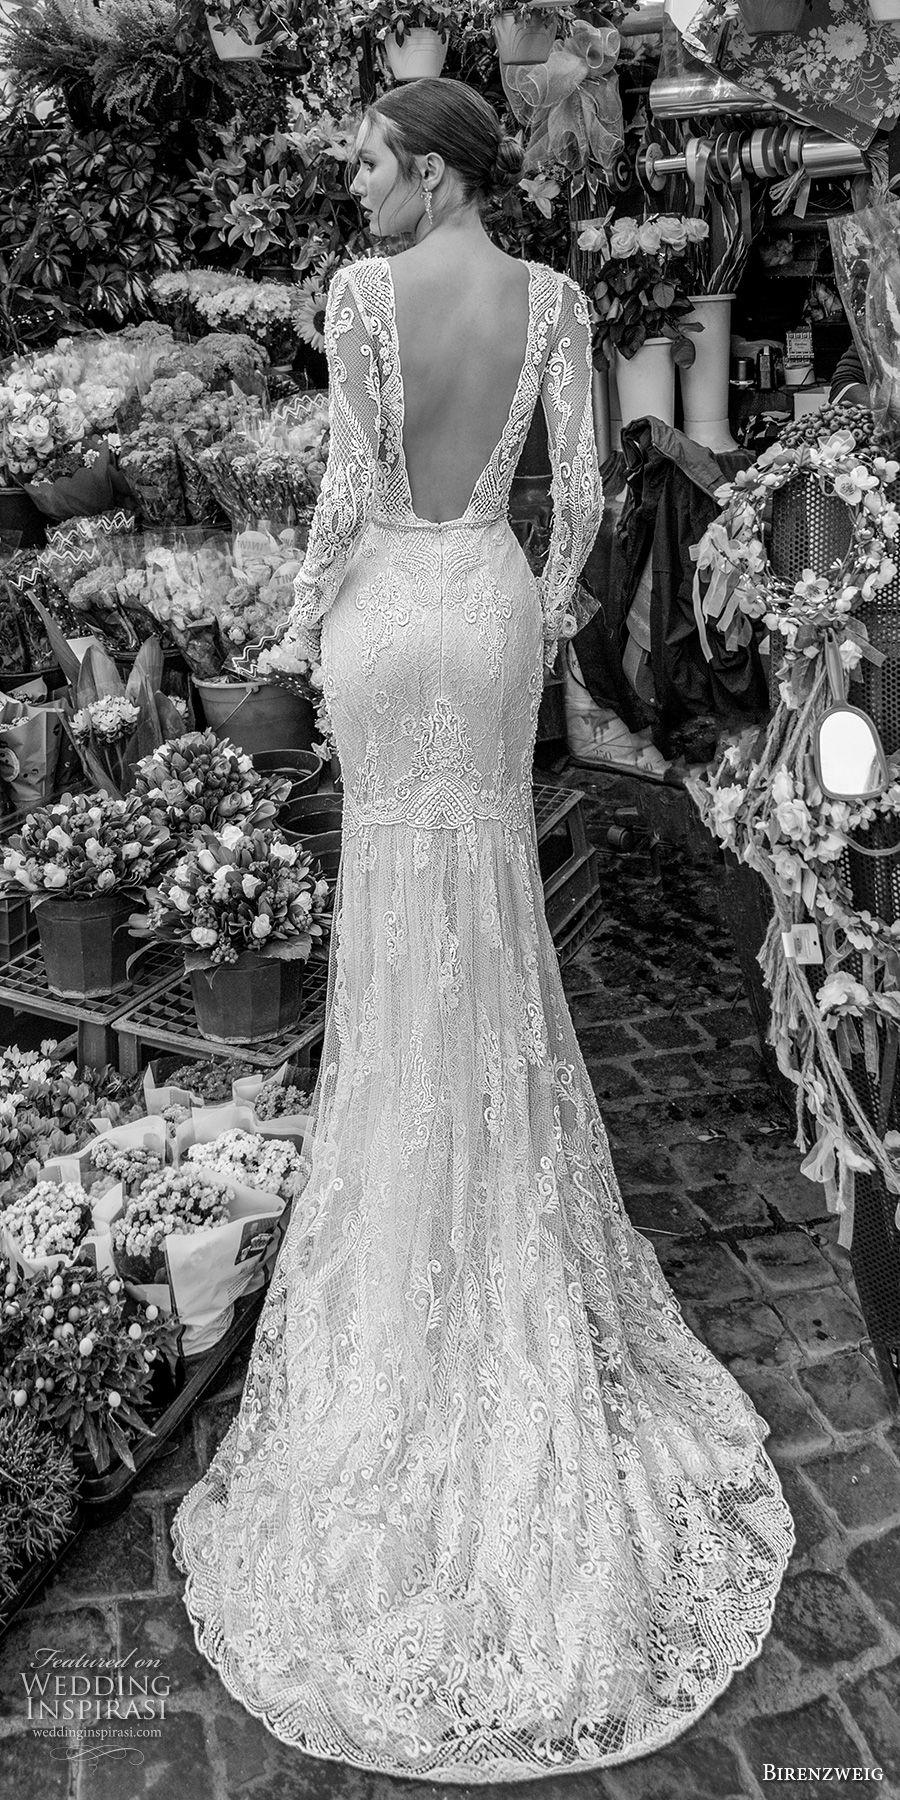 birenzweig 2018 bridal long sleeves illusion bateau neckline full embellishment elegant fit and flare wedding dress open back sweep train (8) bv